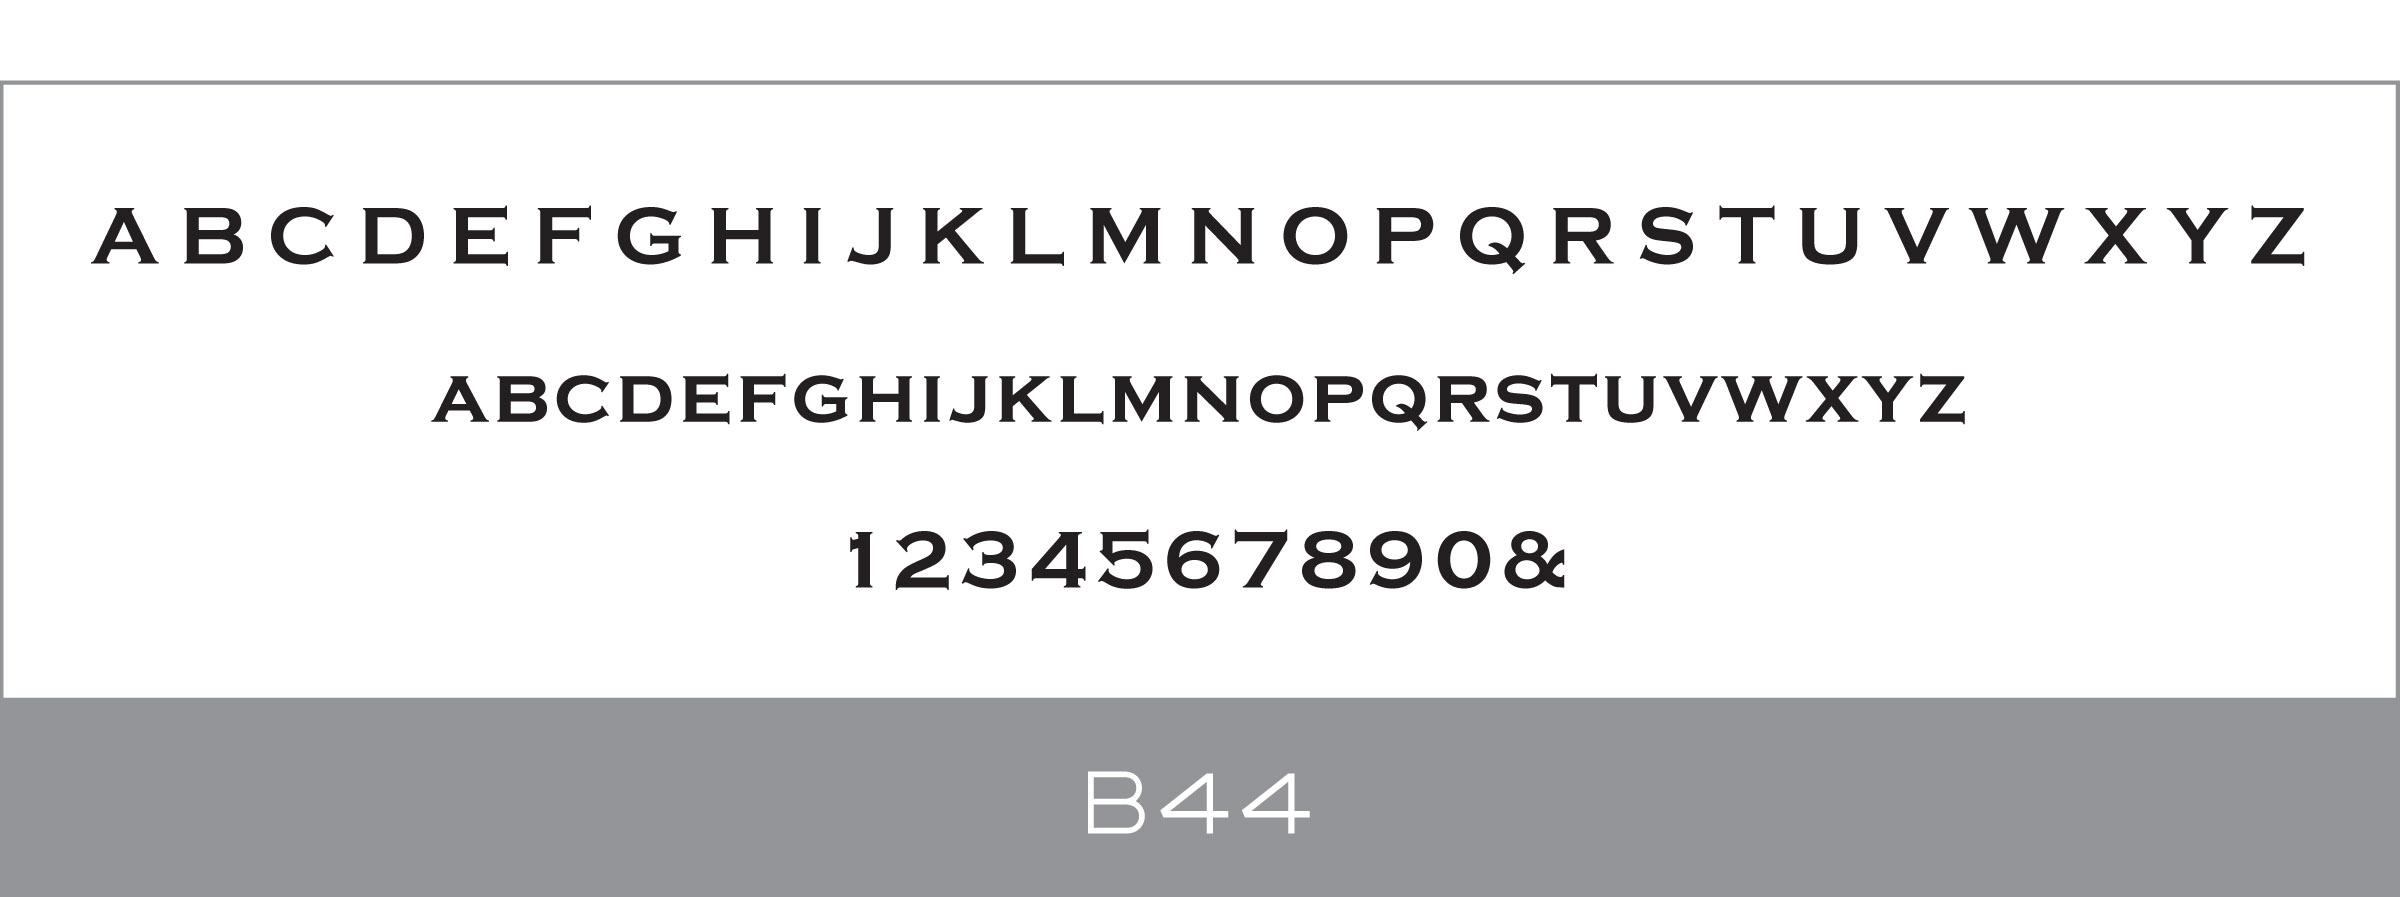 B44_Haute_Papier_Font.jpg